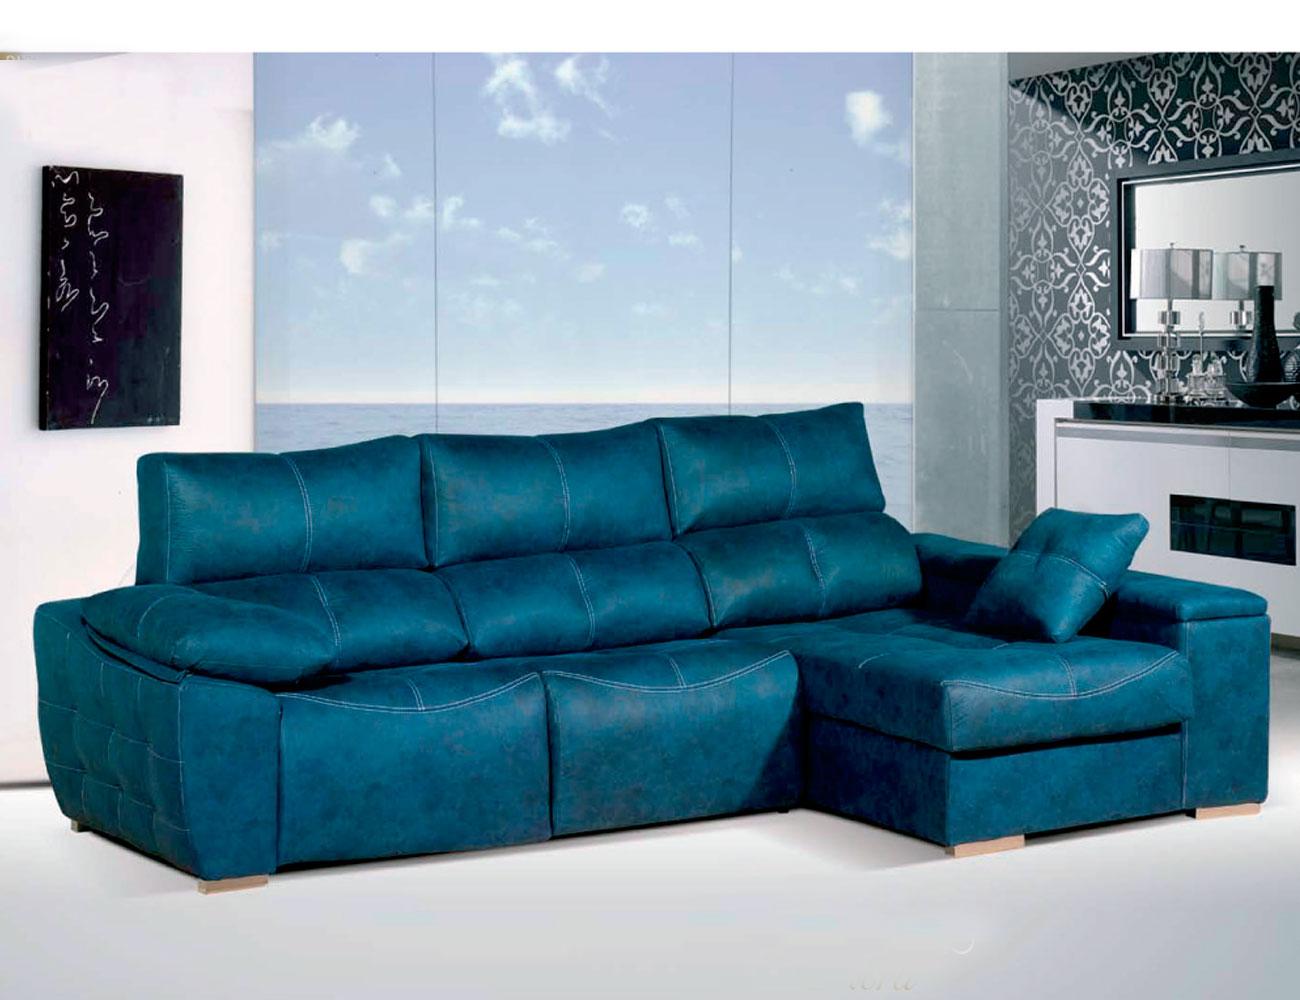 Sofa chaiselongue relax 2 motores anti manchas turquesa29